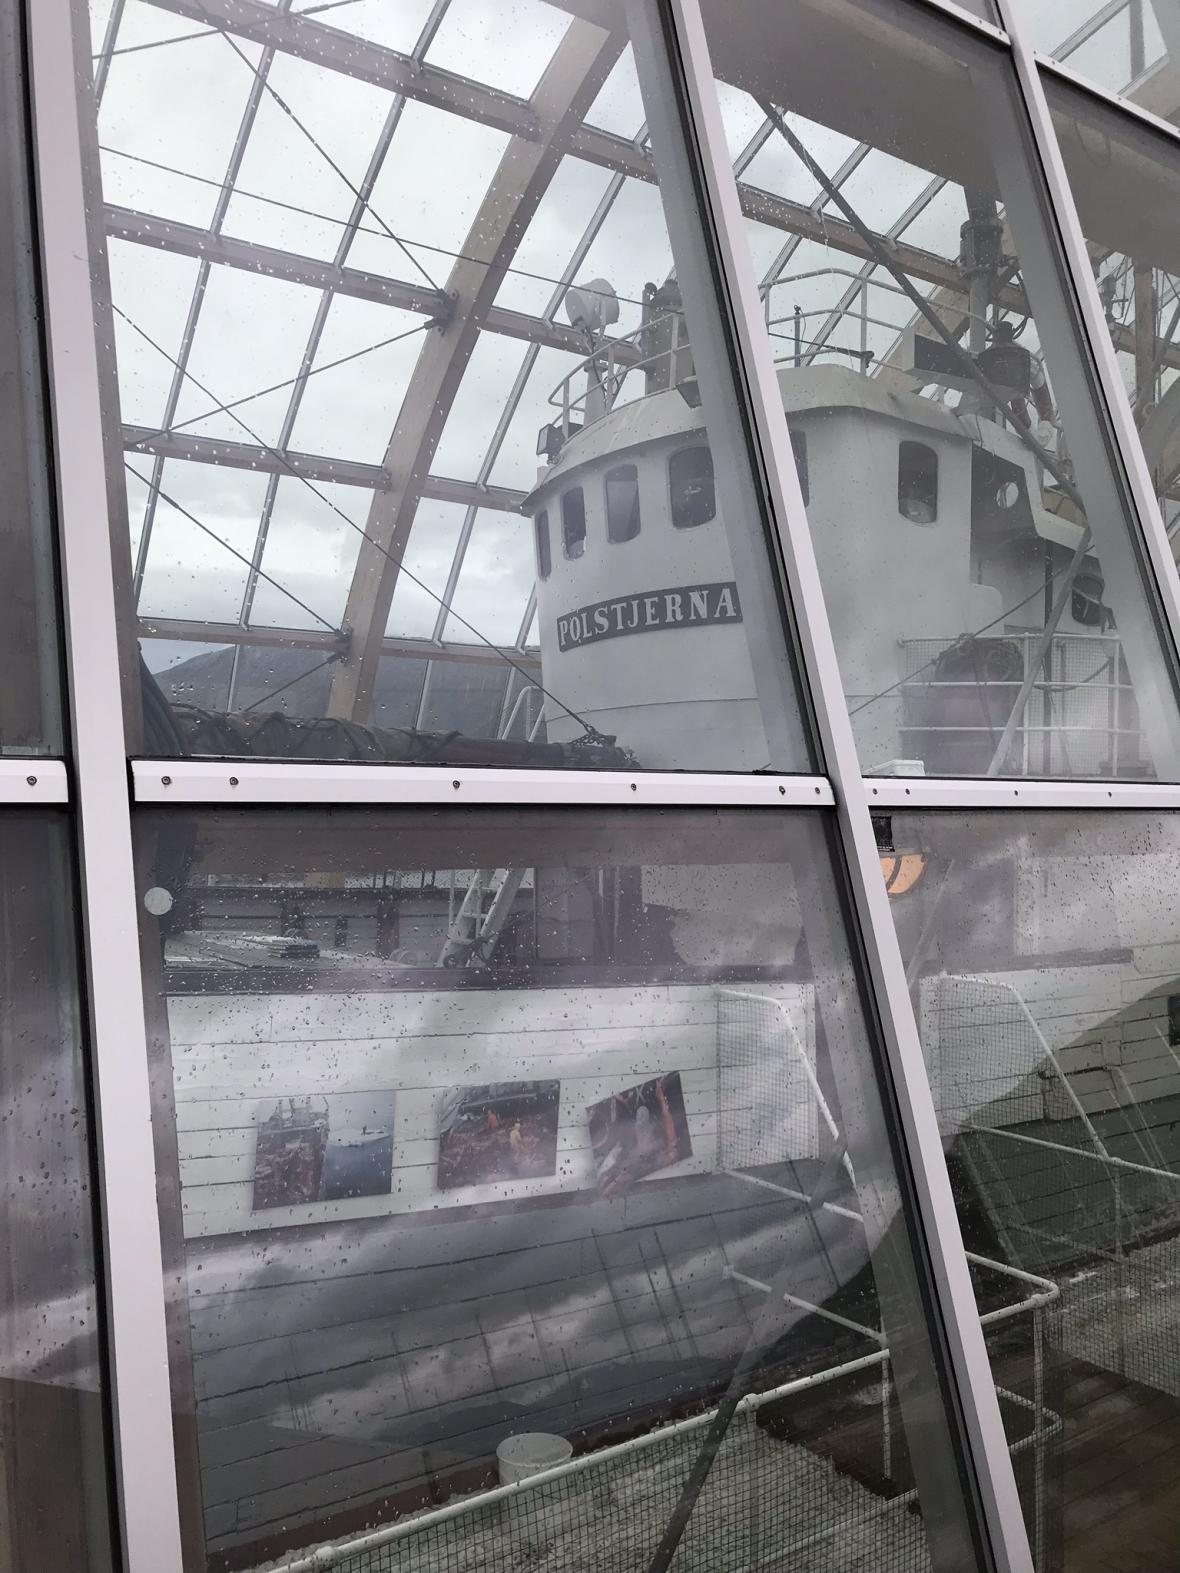 Loď MS Polstjerna